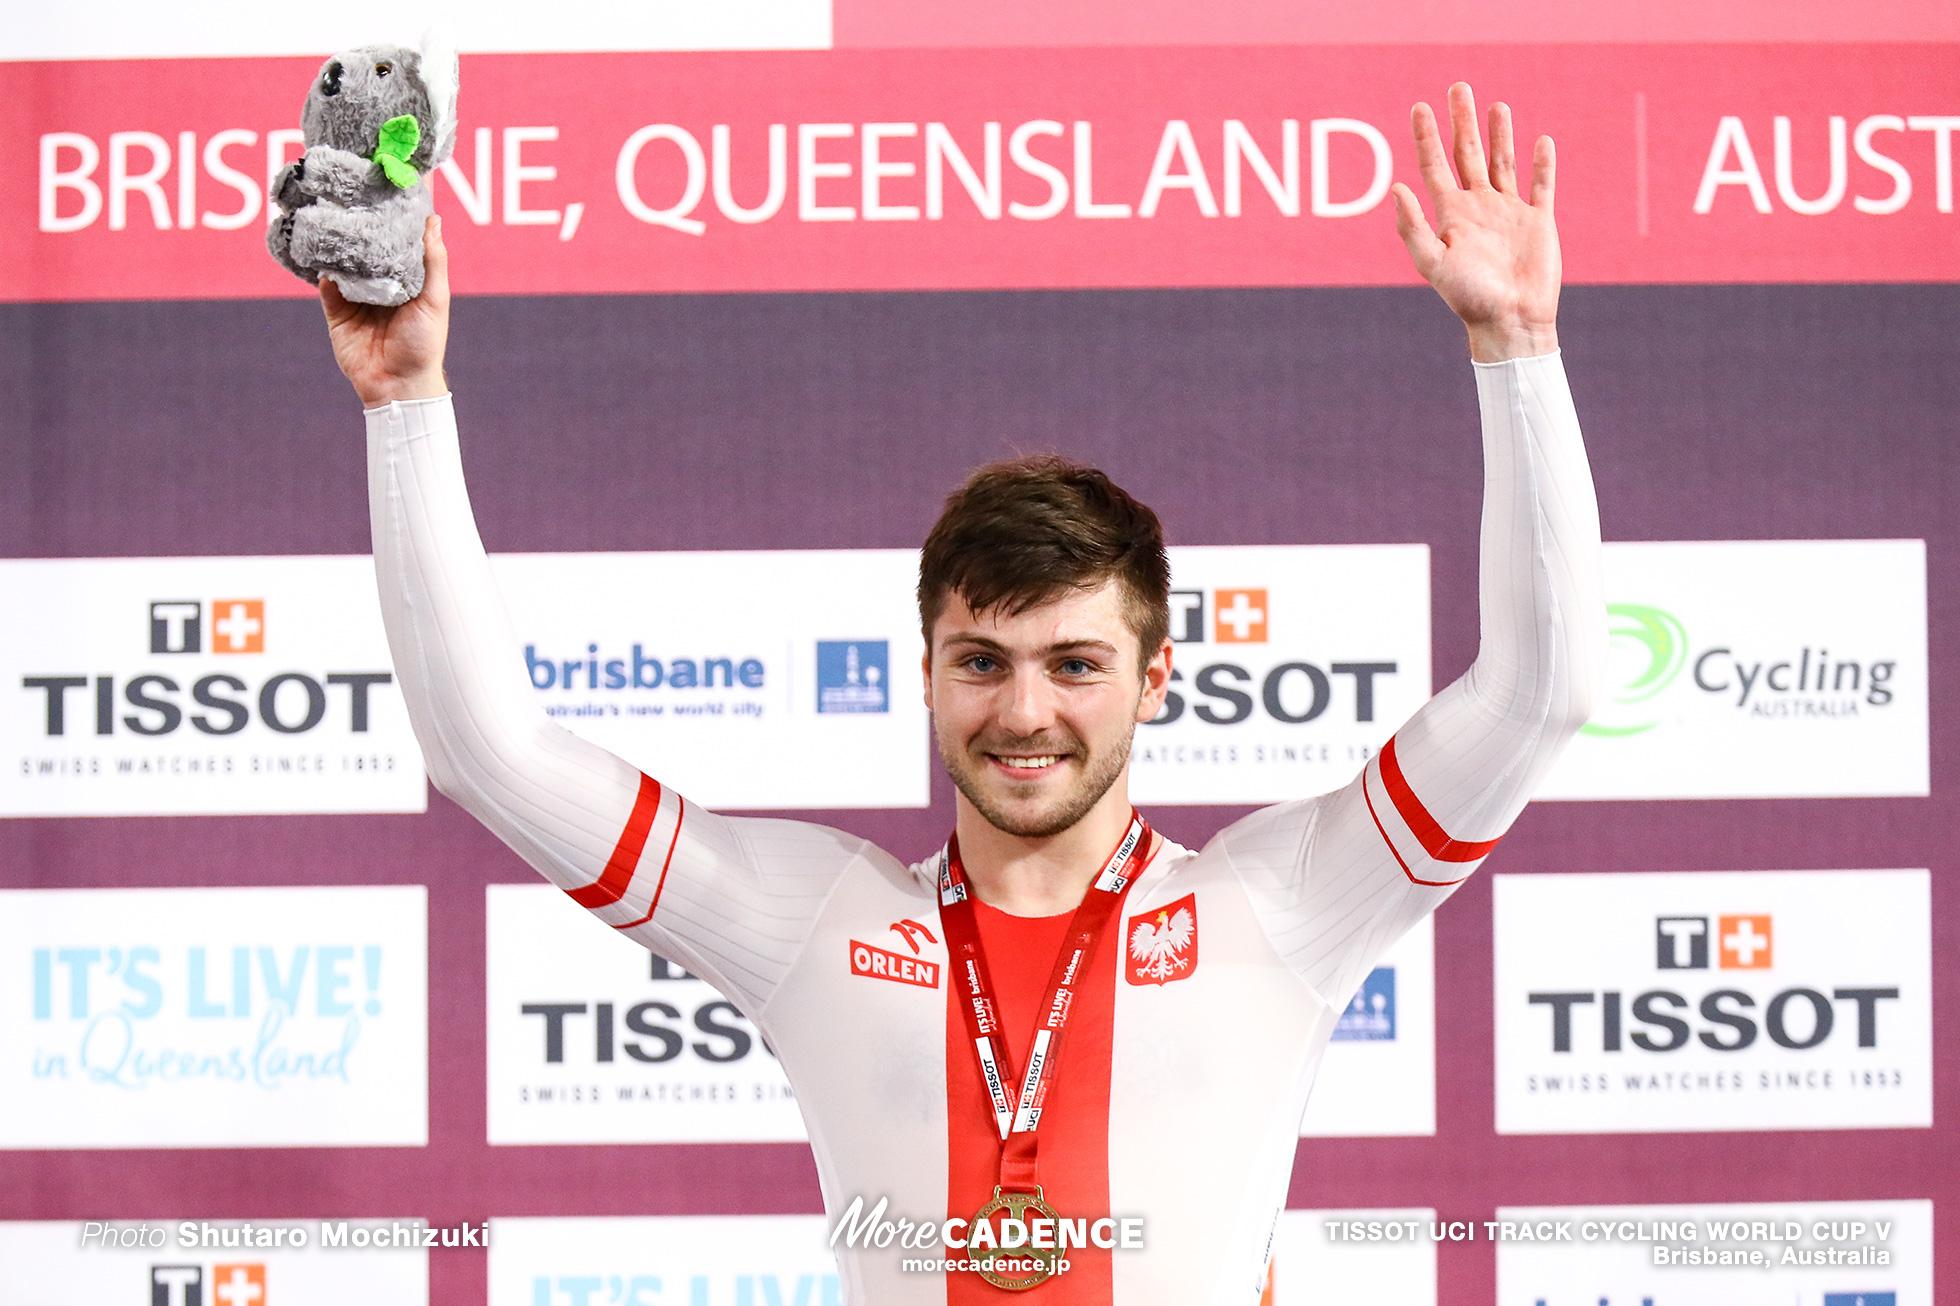 Final / Men's Sprint / TISSOT UCI TRACK CYCLING WORLD CUP V, Brisbane, Australia, Mateusz RUDYK マテウス・ルディク